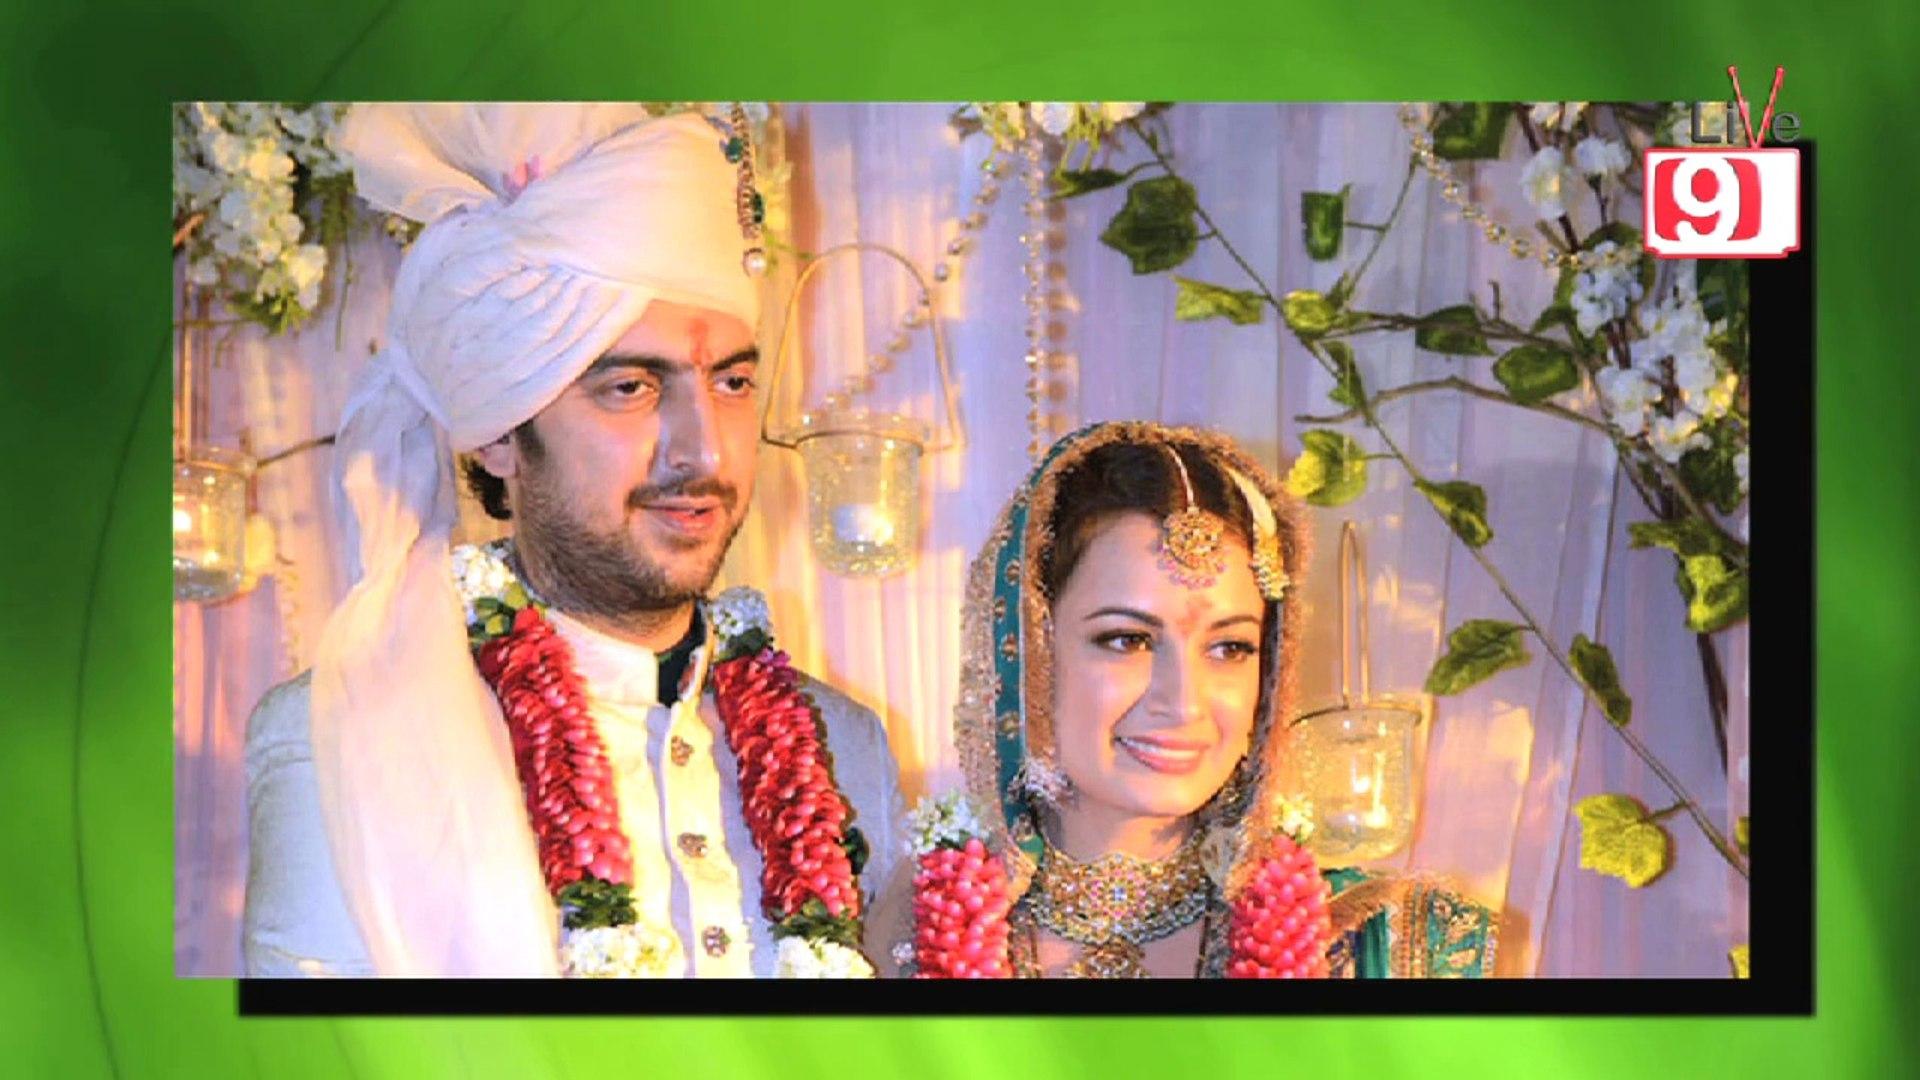 Dia Mirza Ties The Knot With Sahil Sangha - Dia Mirza Wedding